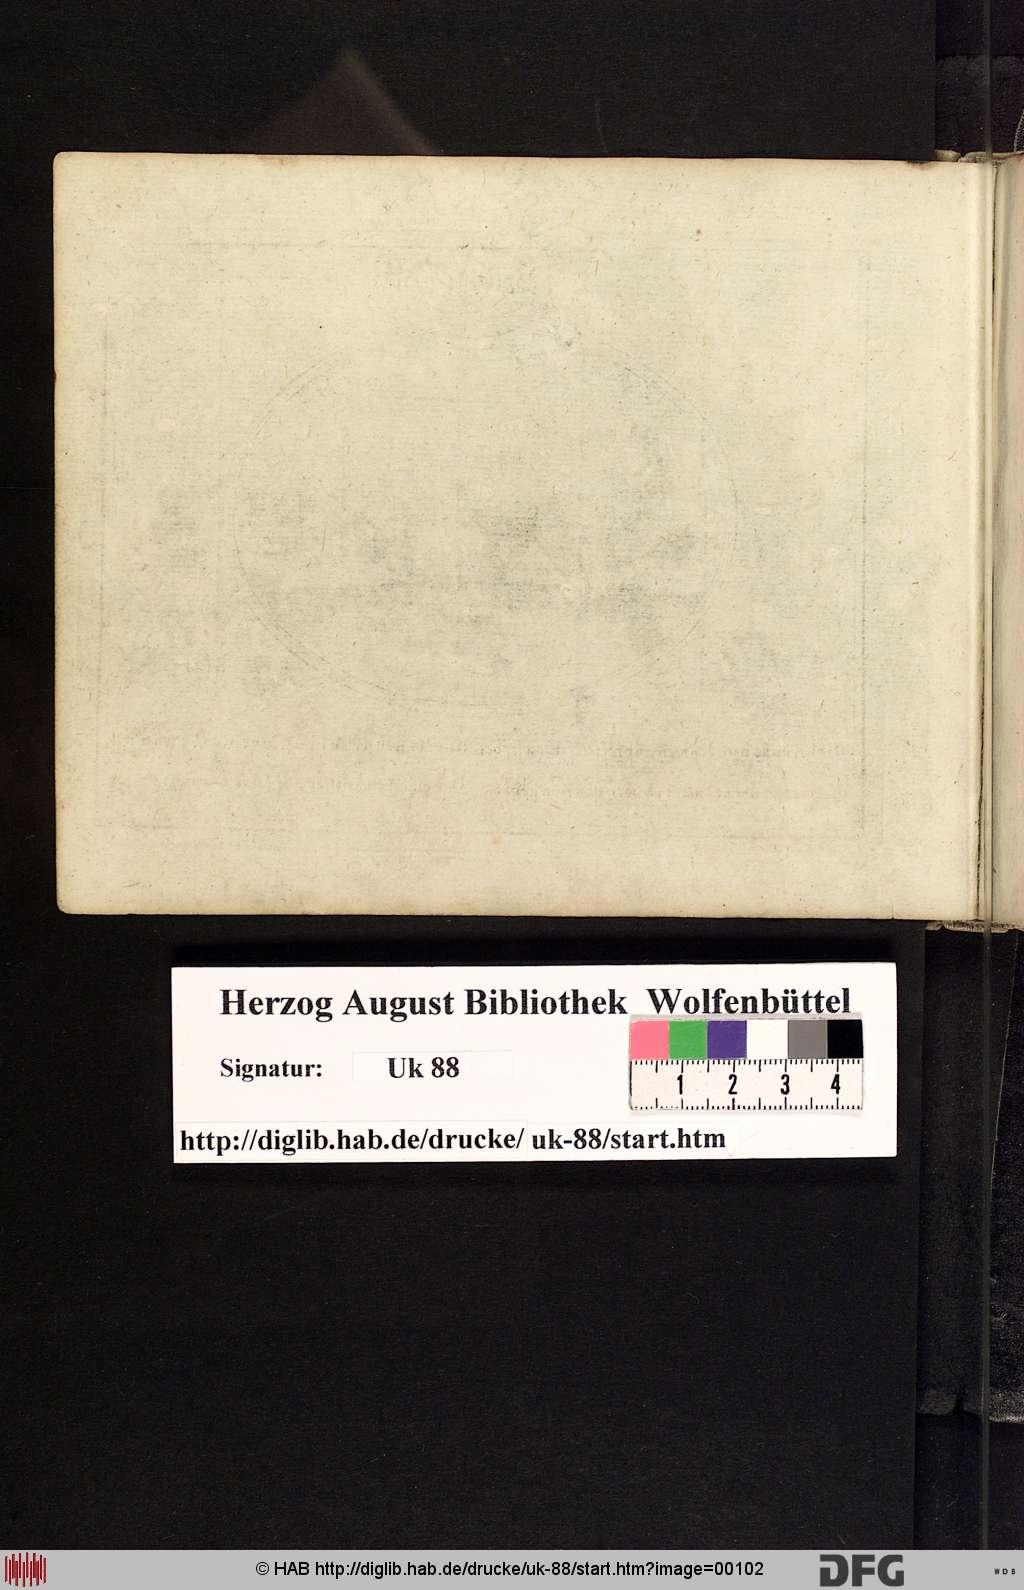 http://diglib.hab.de/drucke/uk-88/00102.jpg